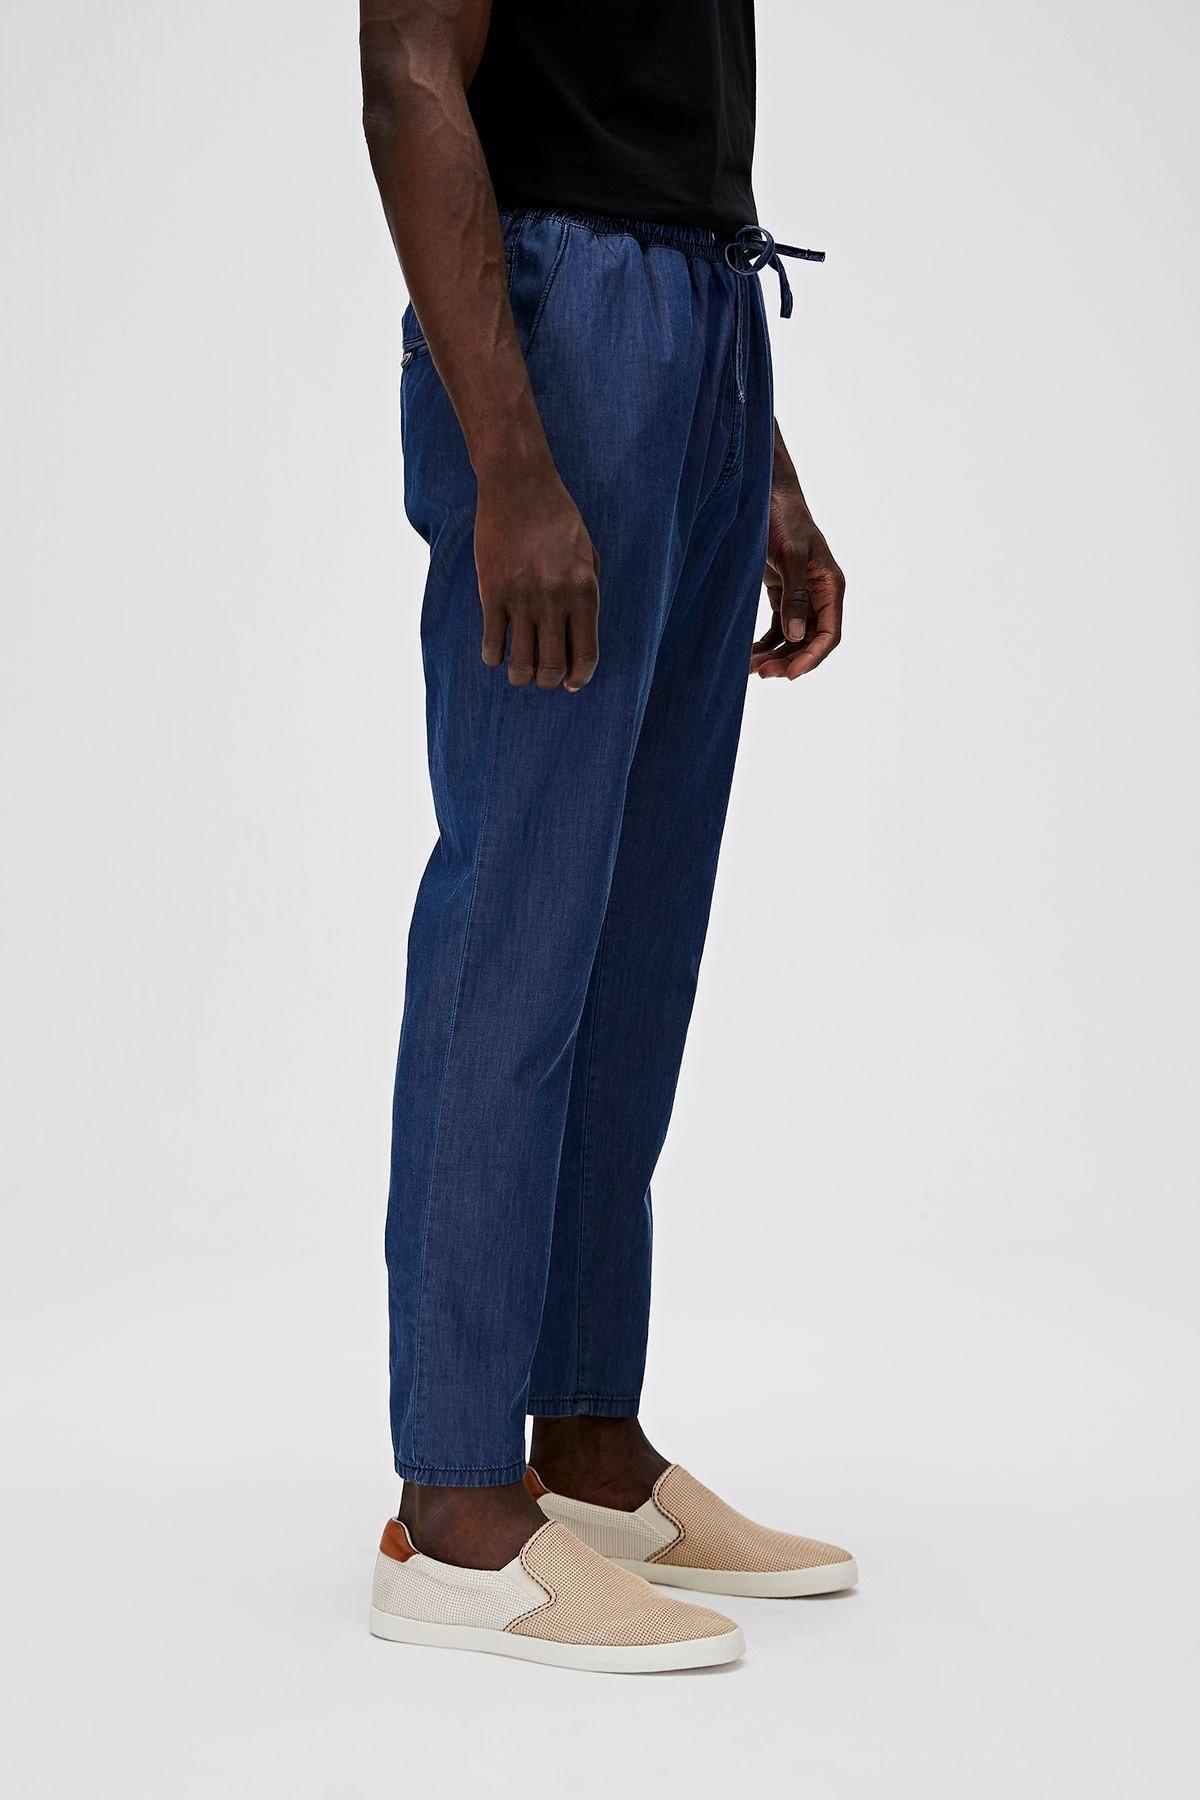 Bad Bear Erkek Mavi Chino İnce Kumaş Pantolon 20.01.16.003 2